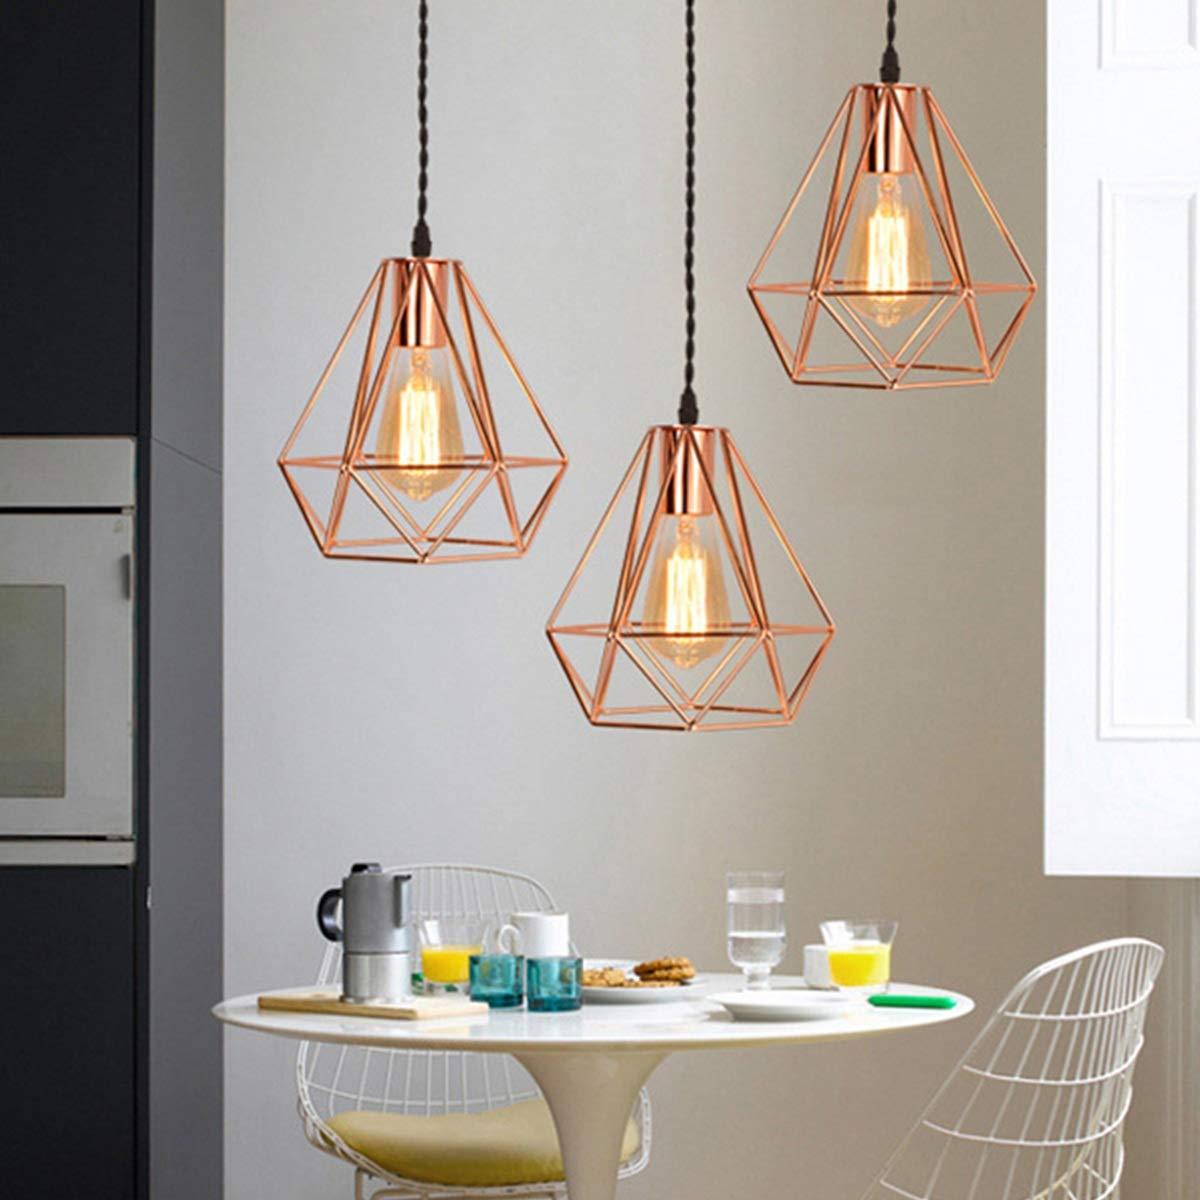 NANGE Modern Chandelier,Personality Plating Rose Gold Pendant Lights,Kitchen Island Table Dining Room Bedroom Entryway Hanging Lamp,E27(Without Light Source) (Color : AC 110V, Size : Gold) by NANGE (Image #6)